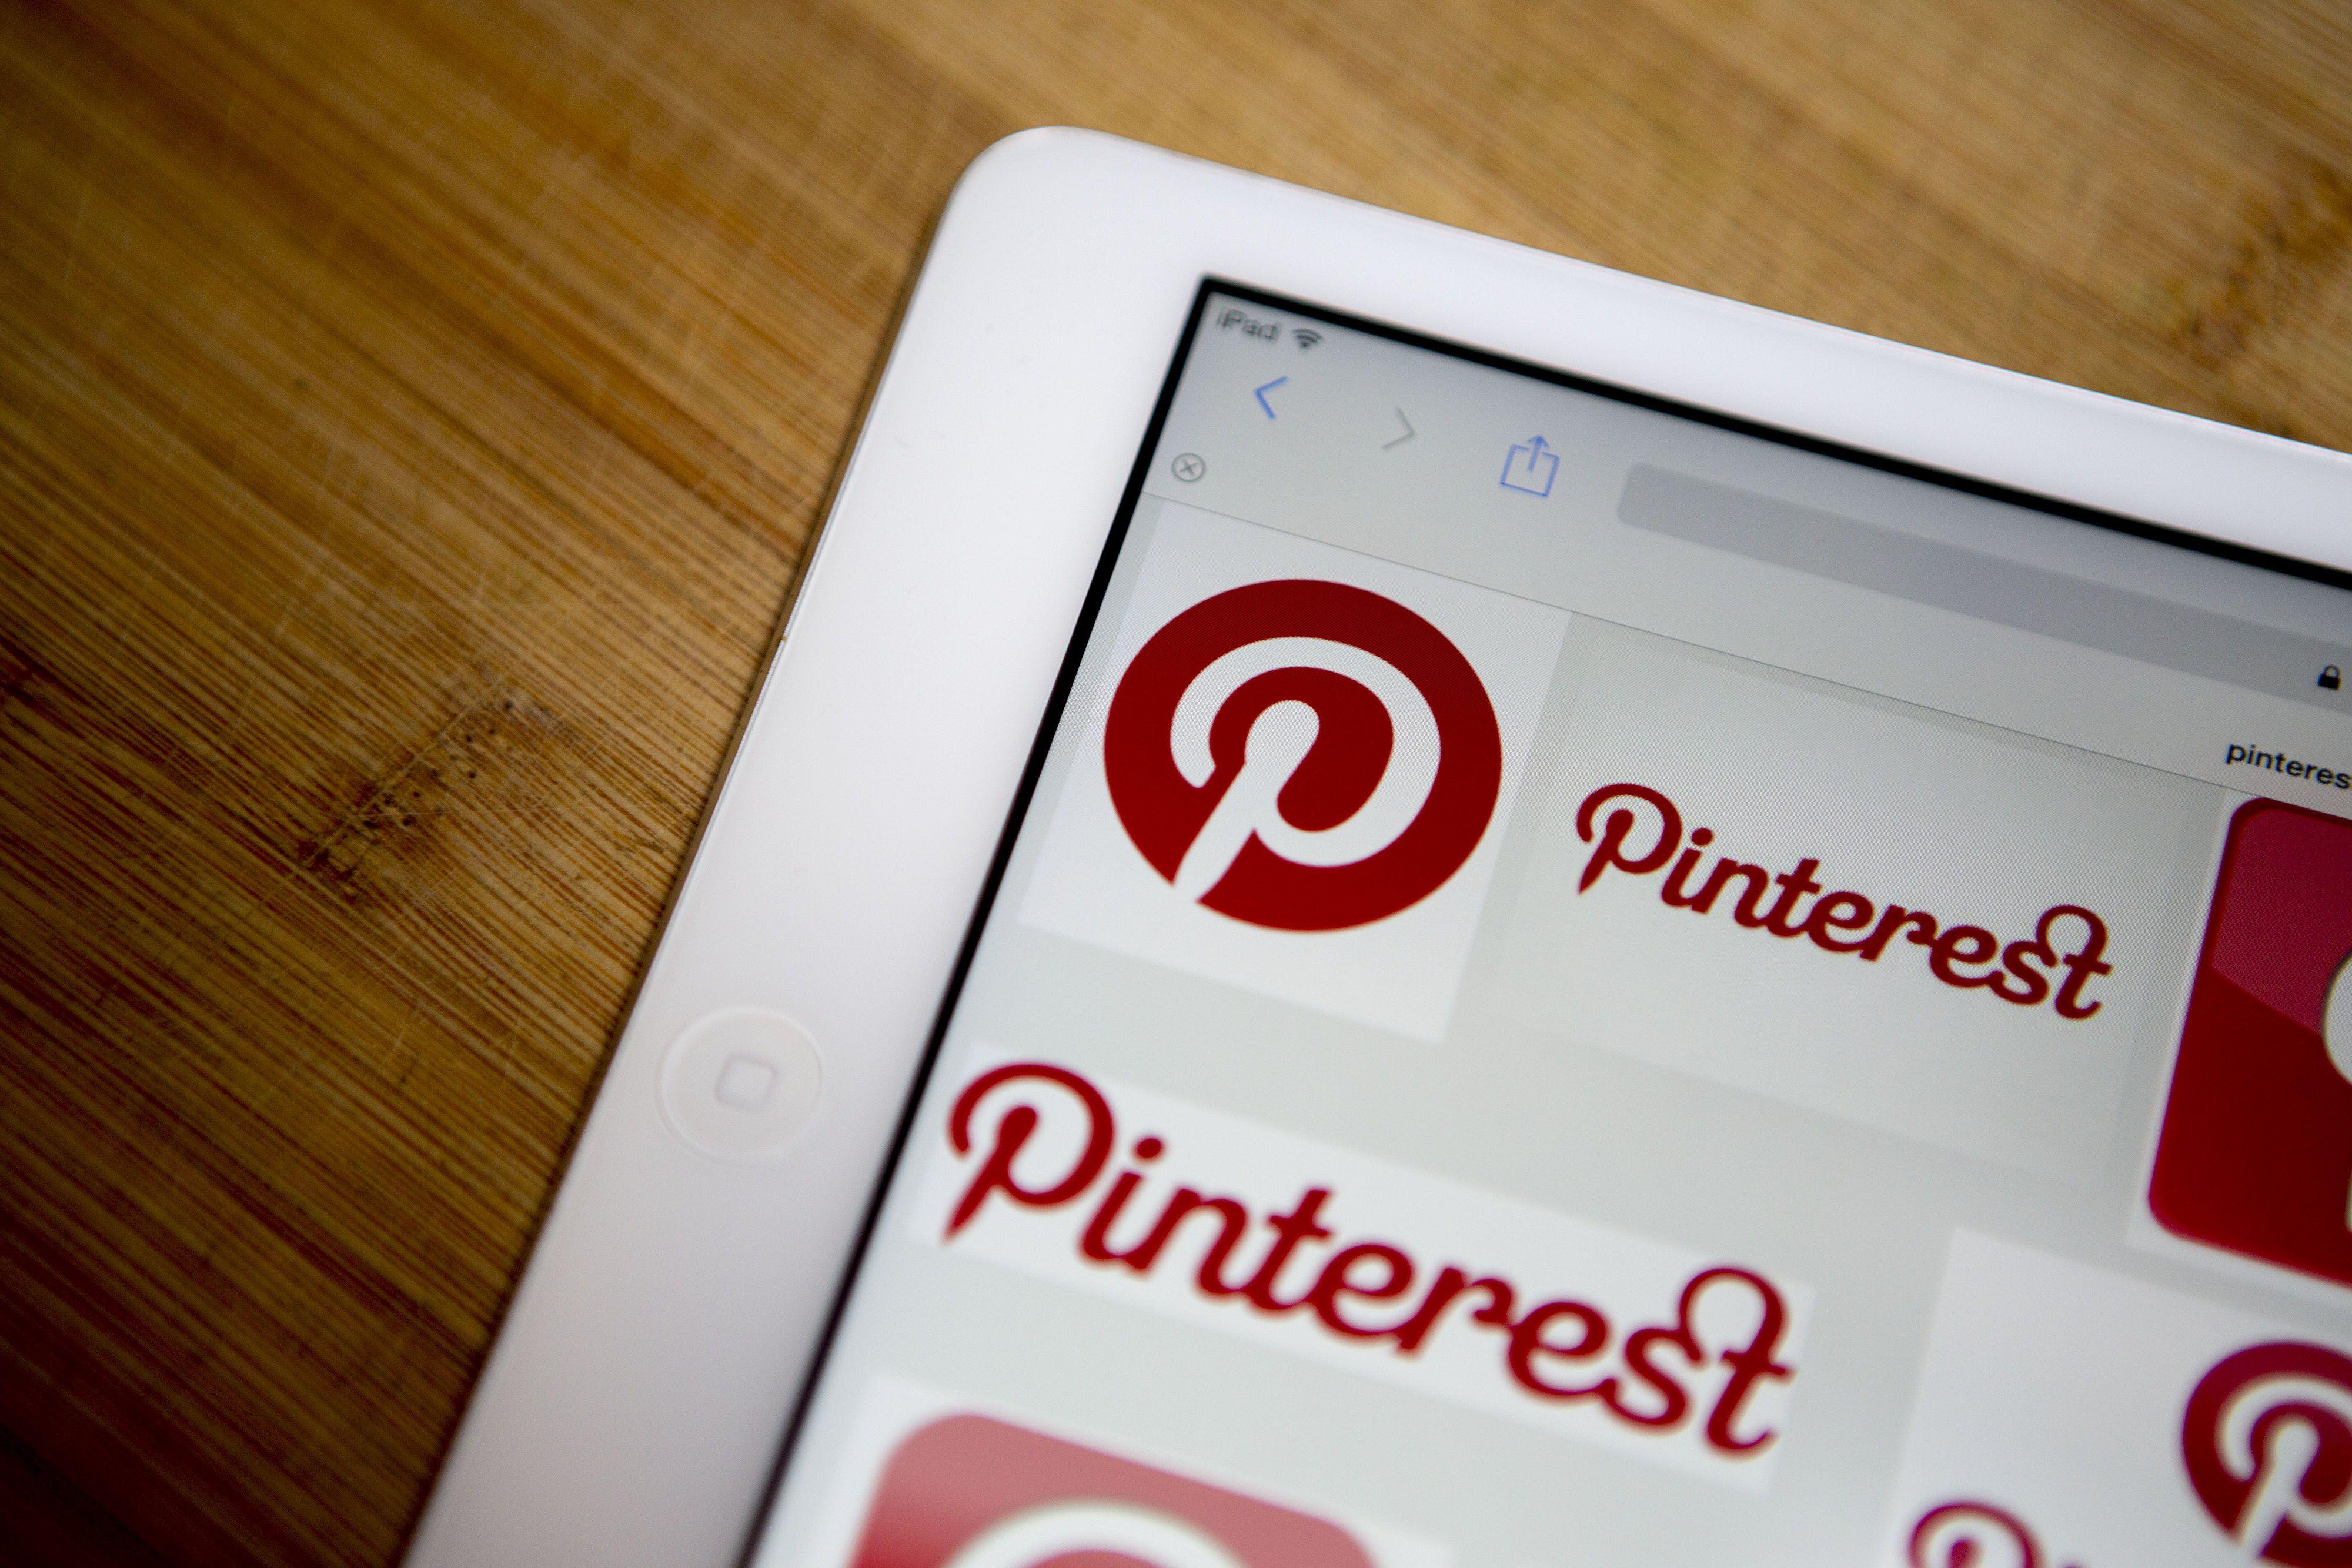 Curso Pinterest Expert Como usar pinterest, Ideias de